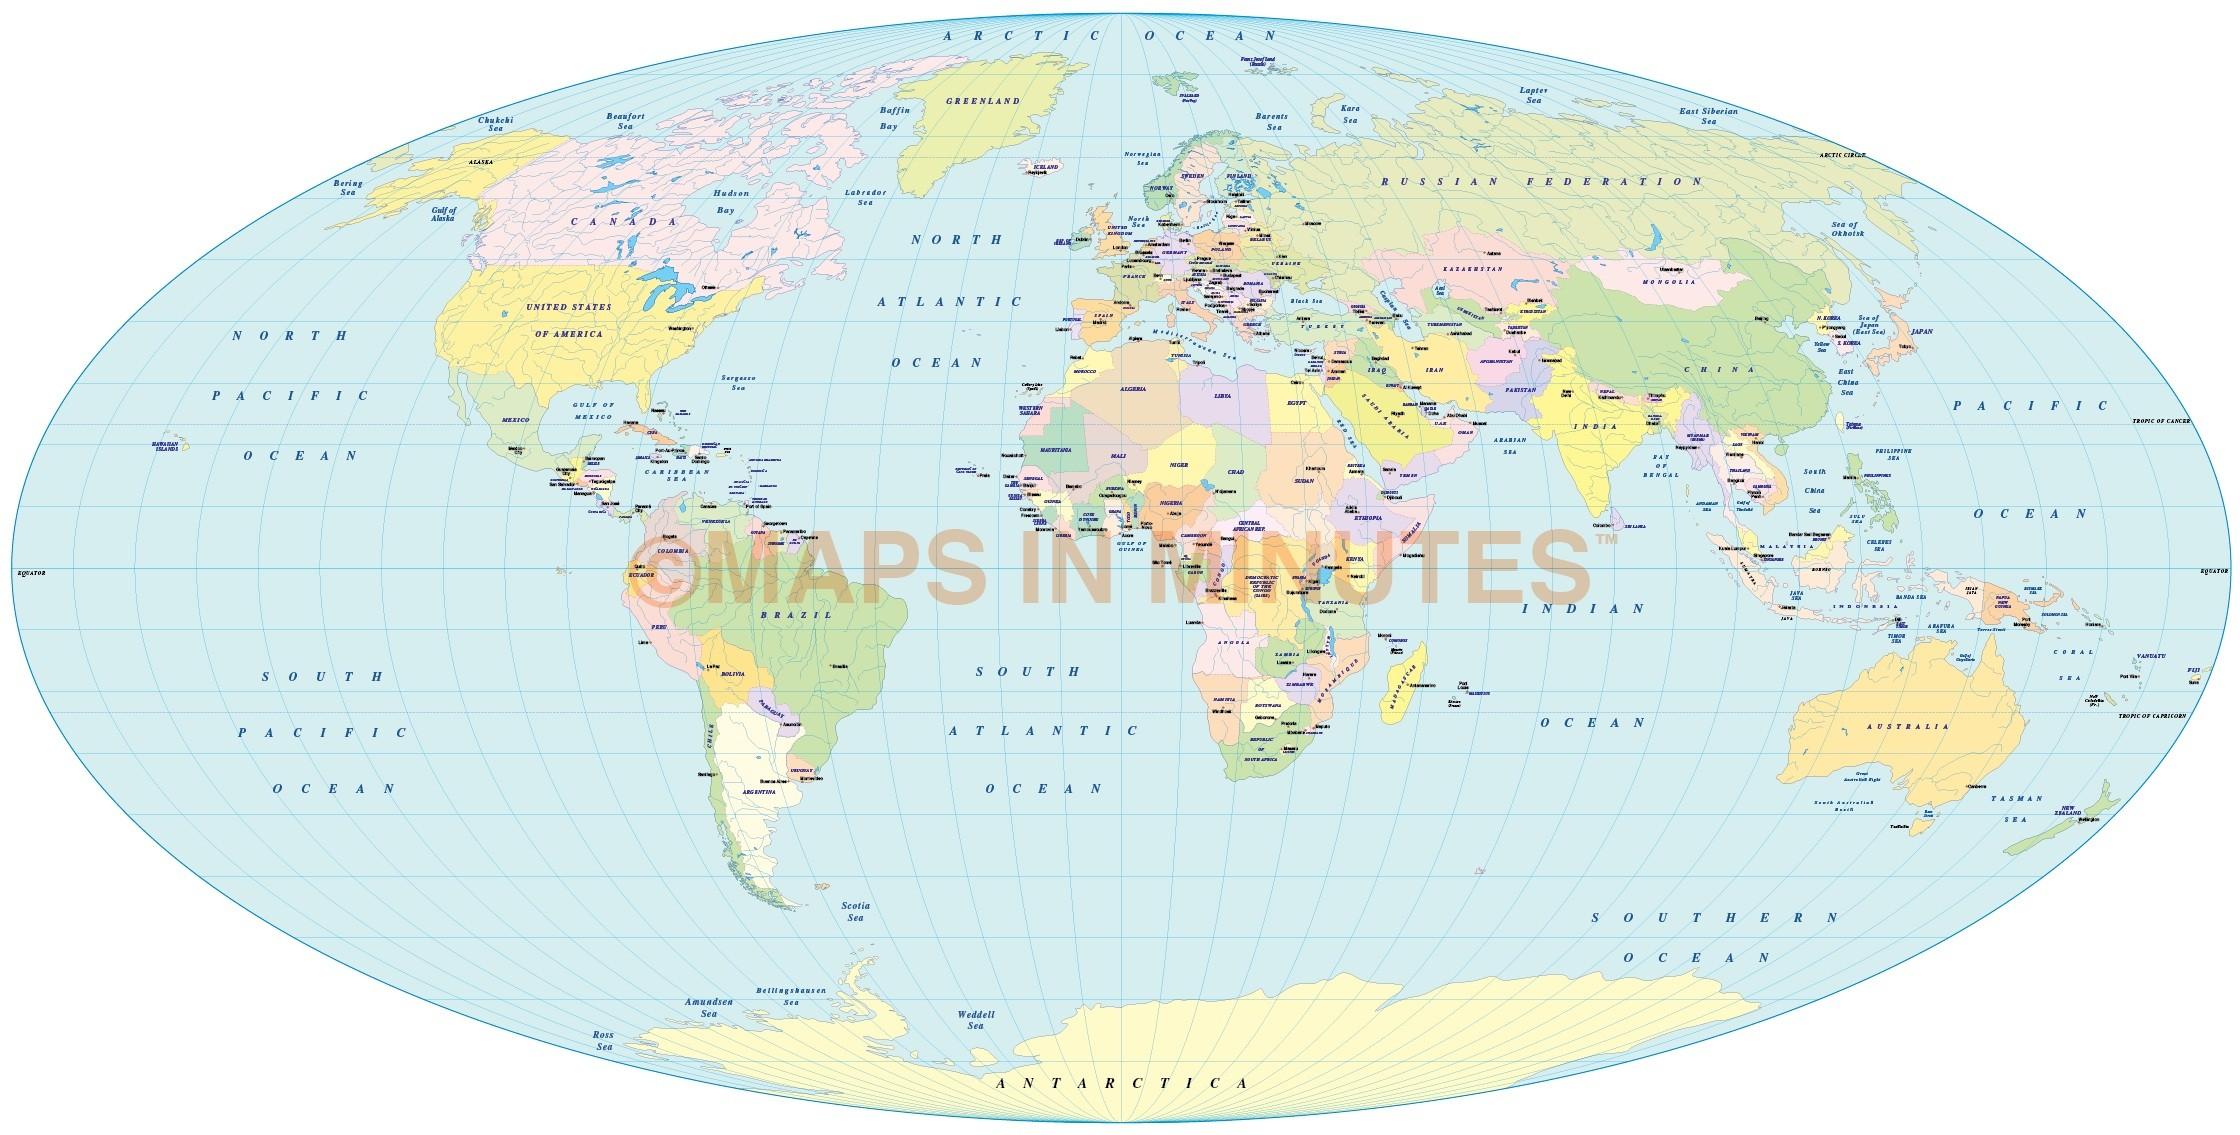 Vector political world map apianus ii projection uk centric in digital vector world map apianus ii projection 100m scale uk centric digital file in gumiabroncs Gallery